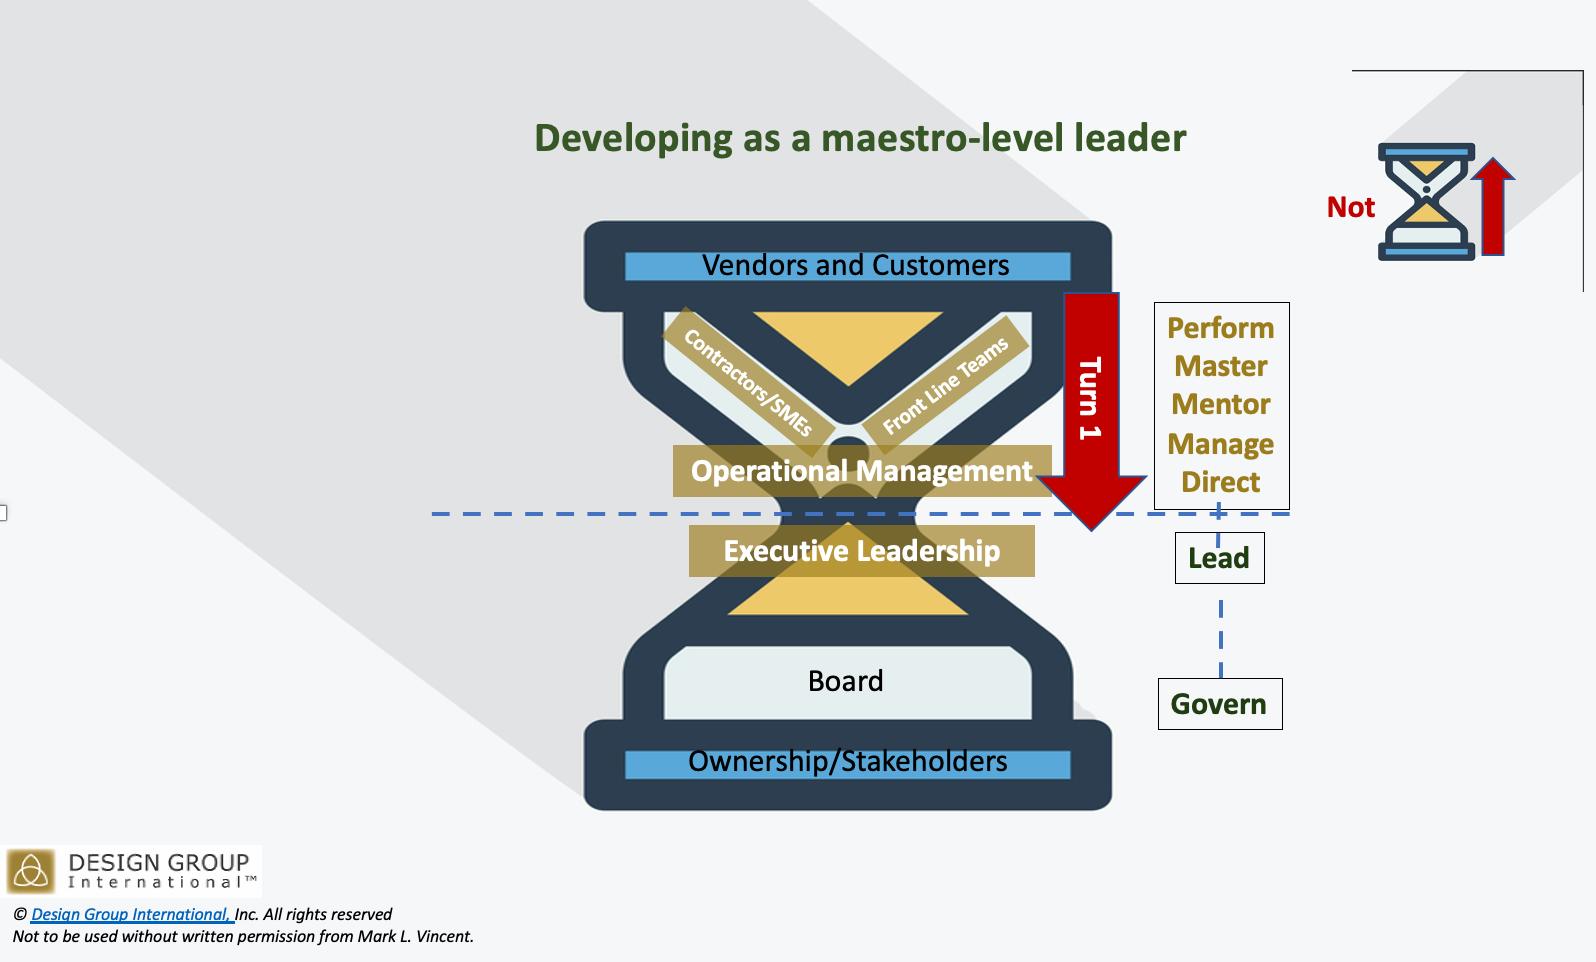 Maestro-level leader - Turn 1